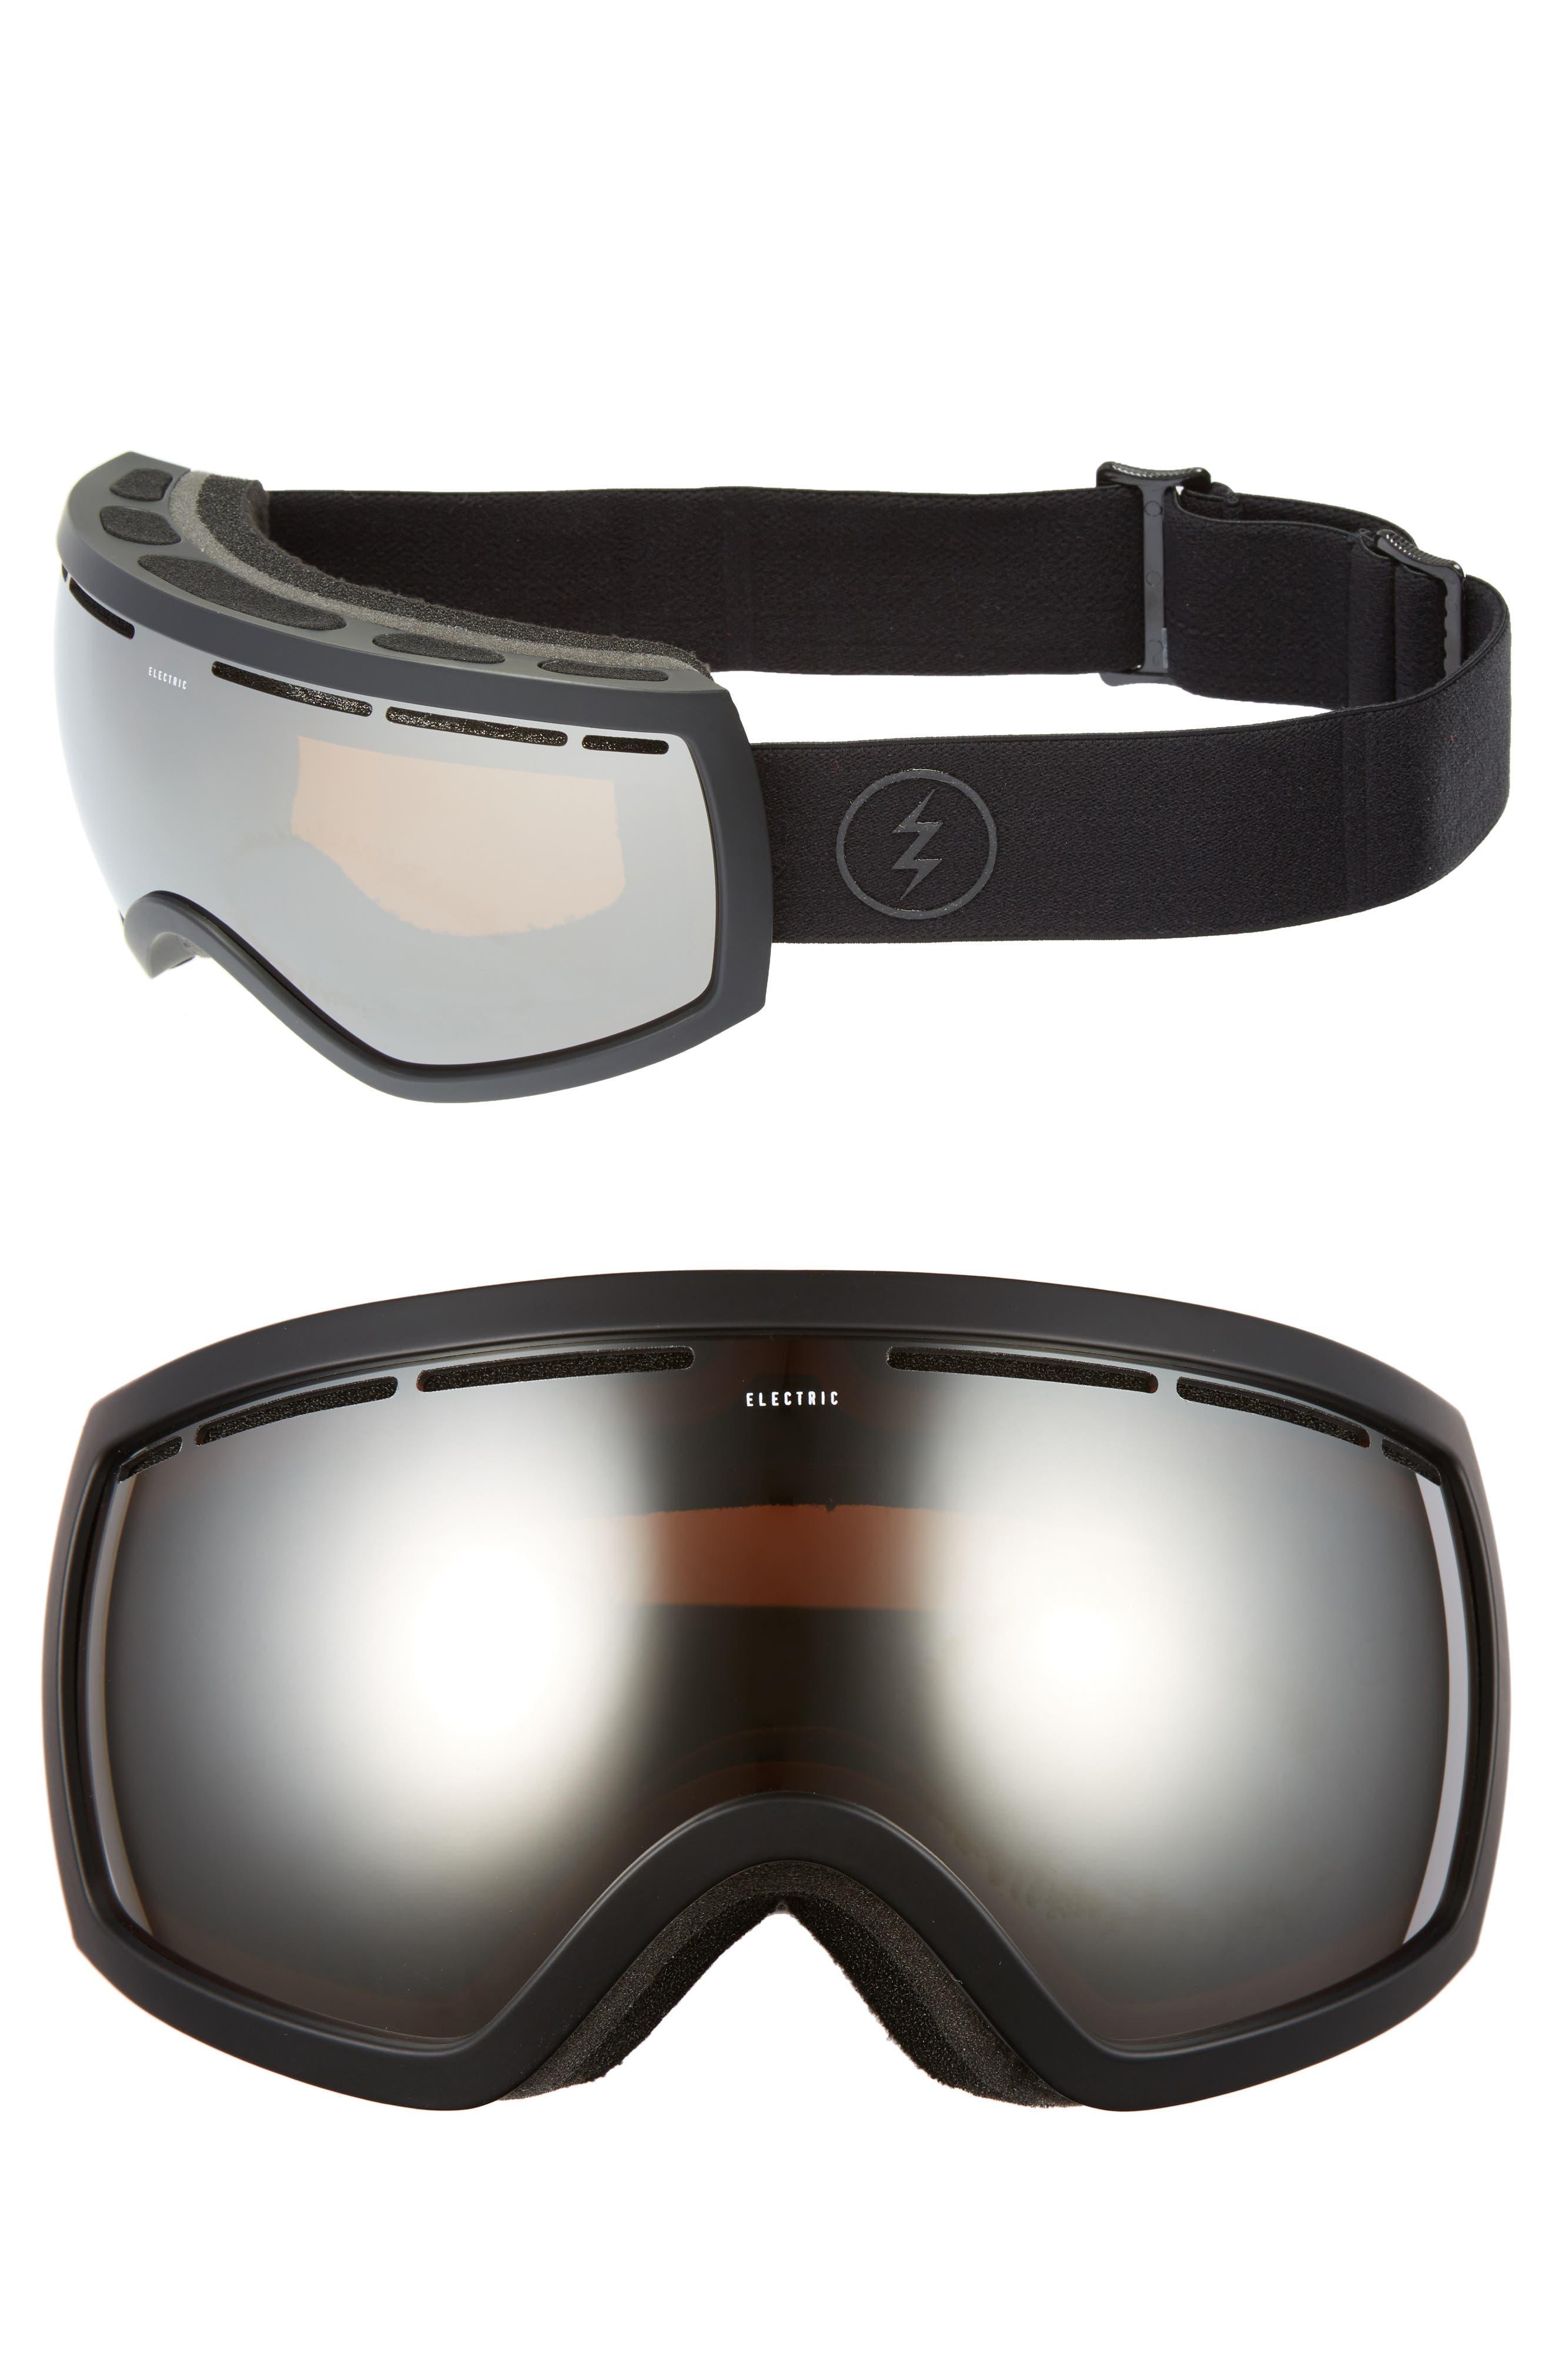 EG 2.5 215mm Snow Goggles,                             Main thumbnail 2, color,